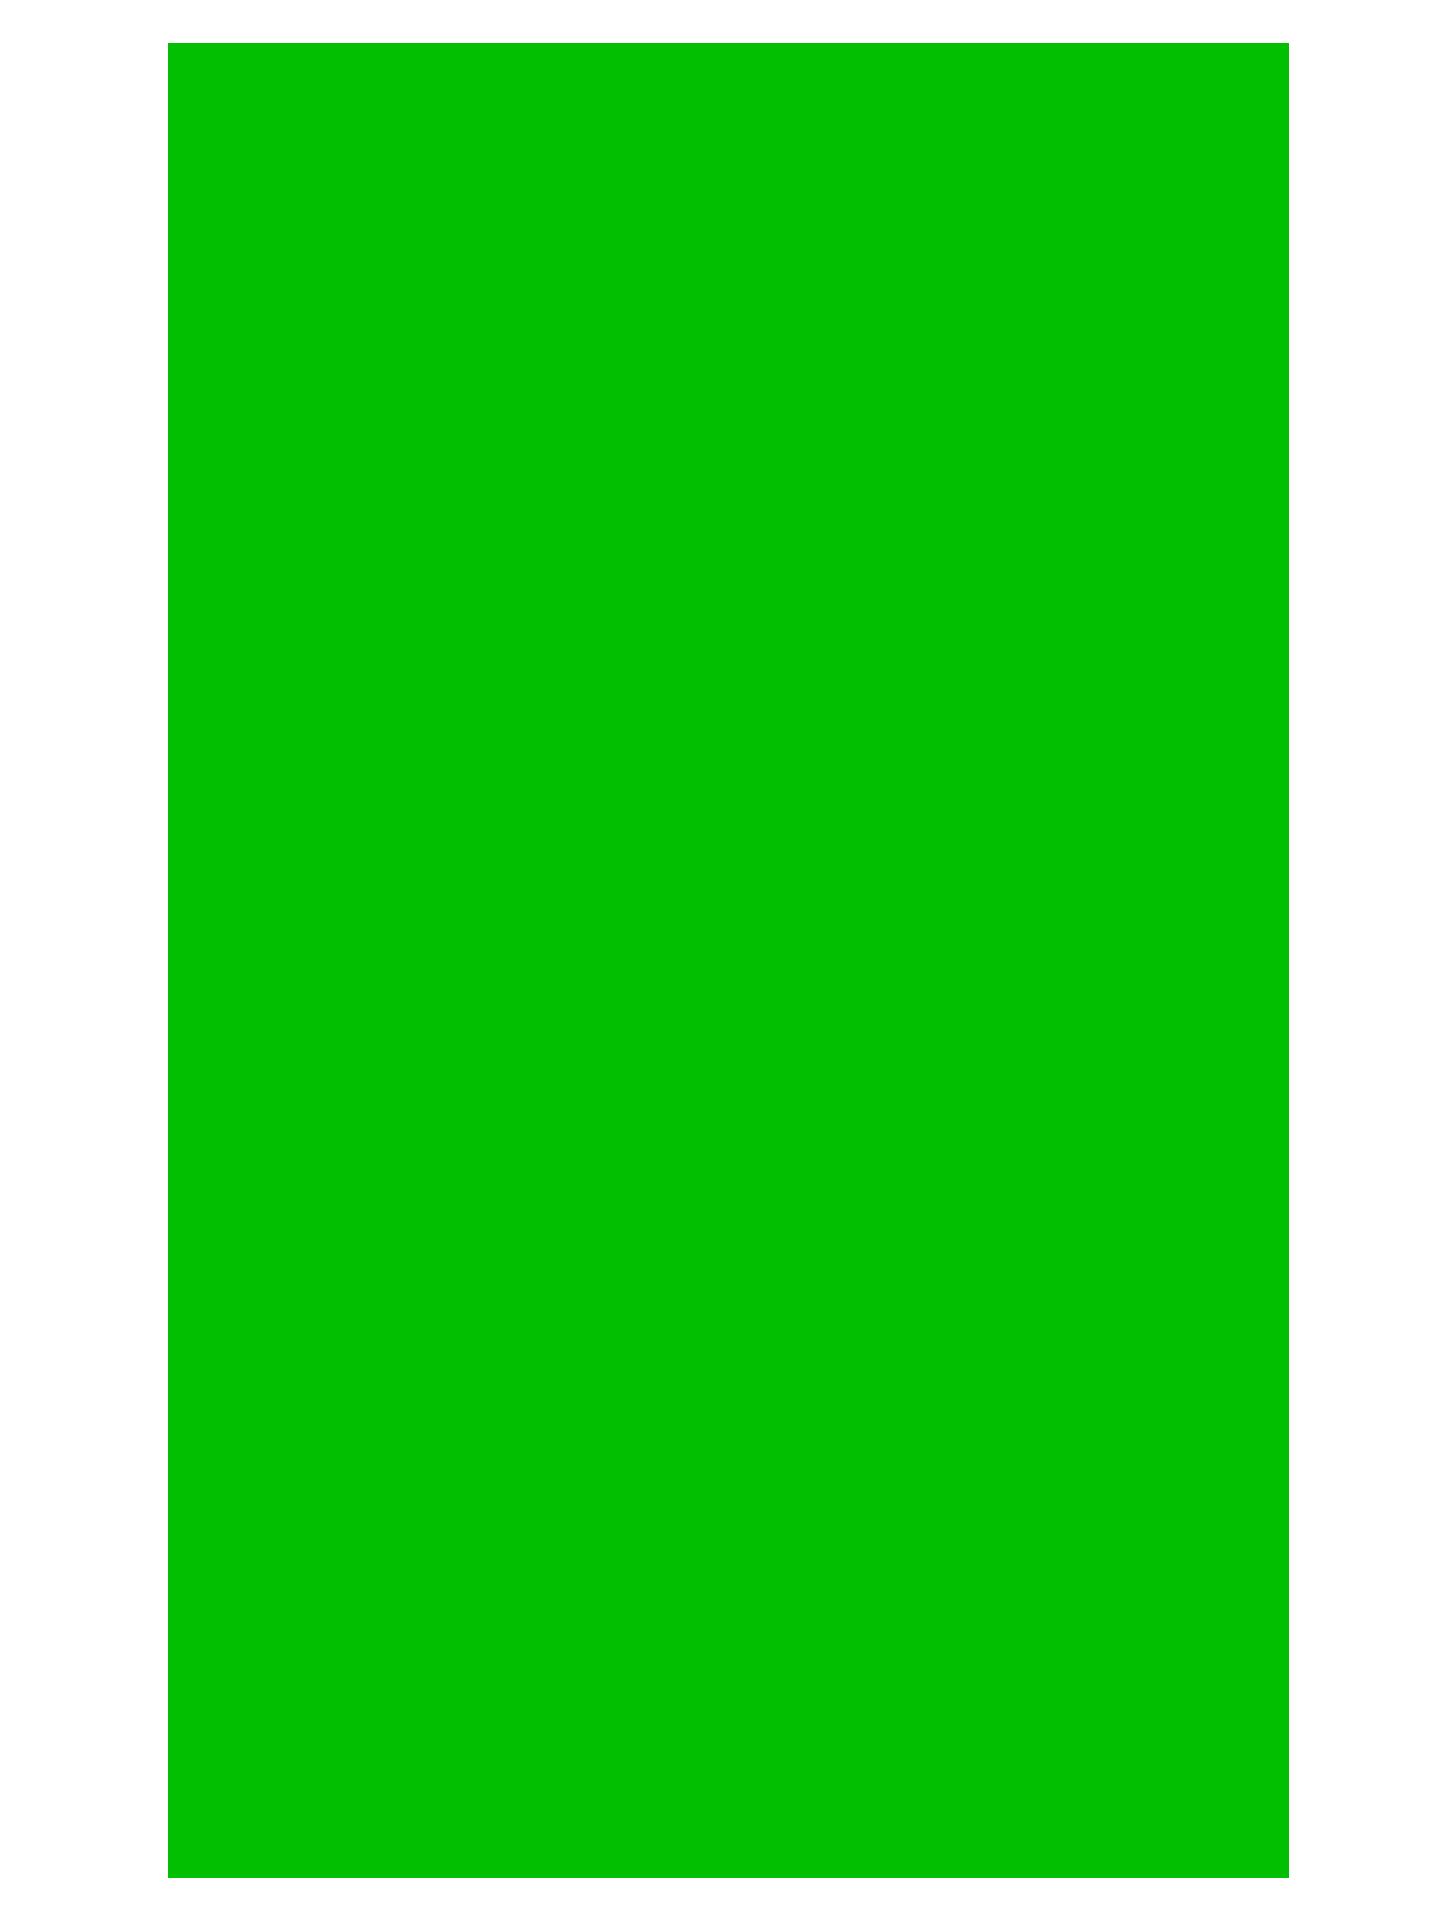 Enlightened ingress wiki fandom powered by wikia the enlightened enlightend logo altavistaventures Gallery